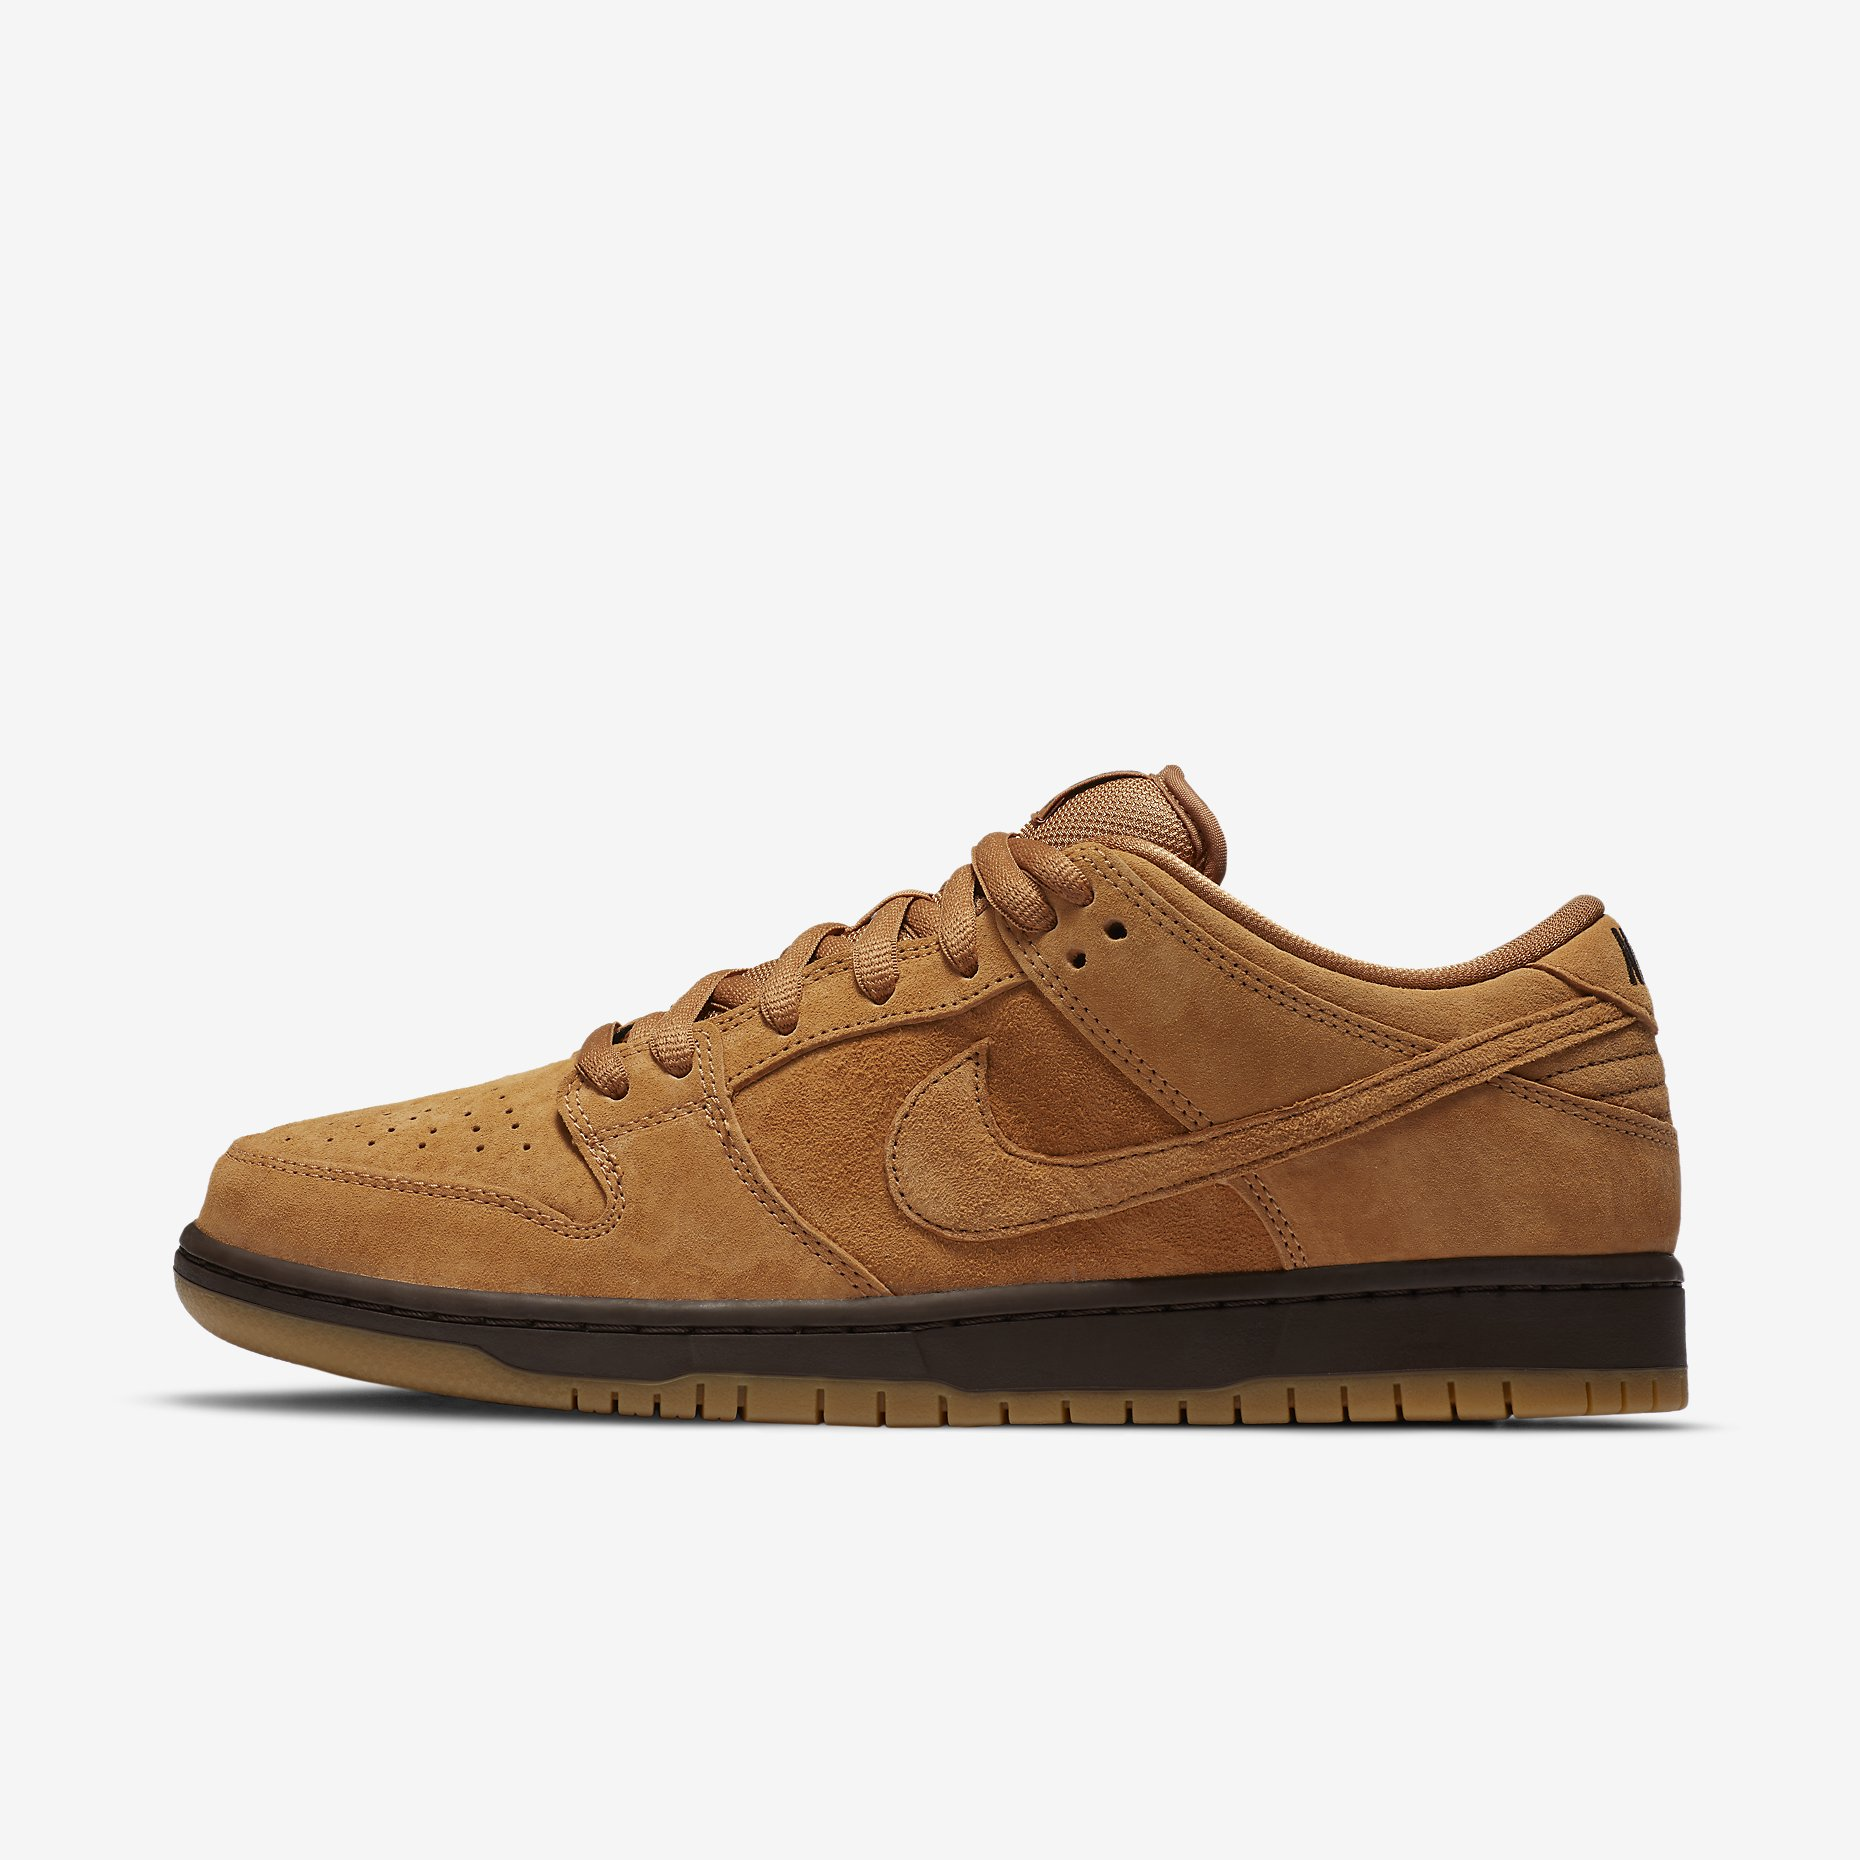 Nike SB Dunk Low Pro 'Wheat'}